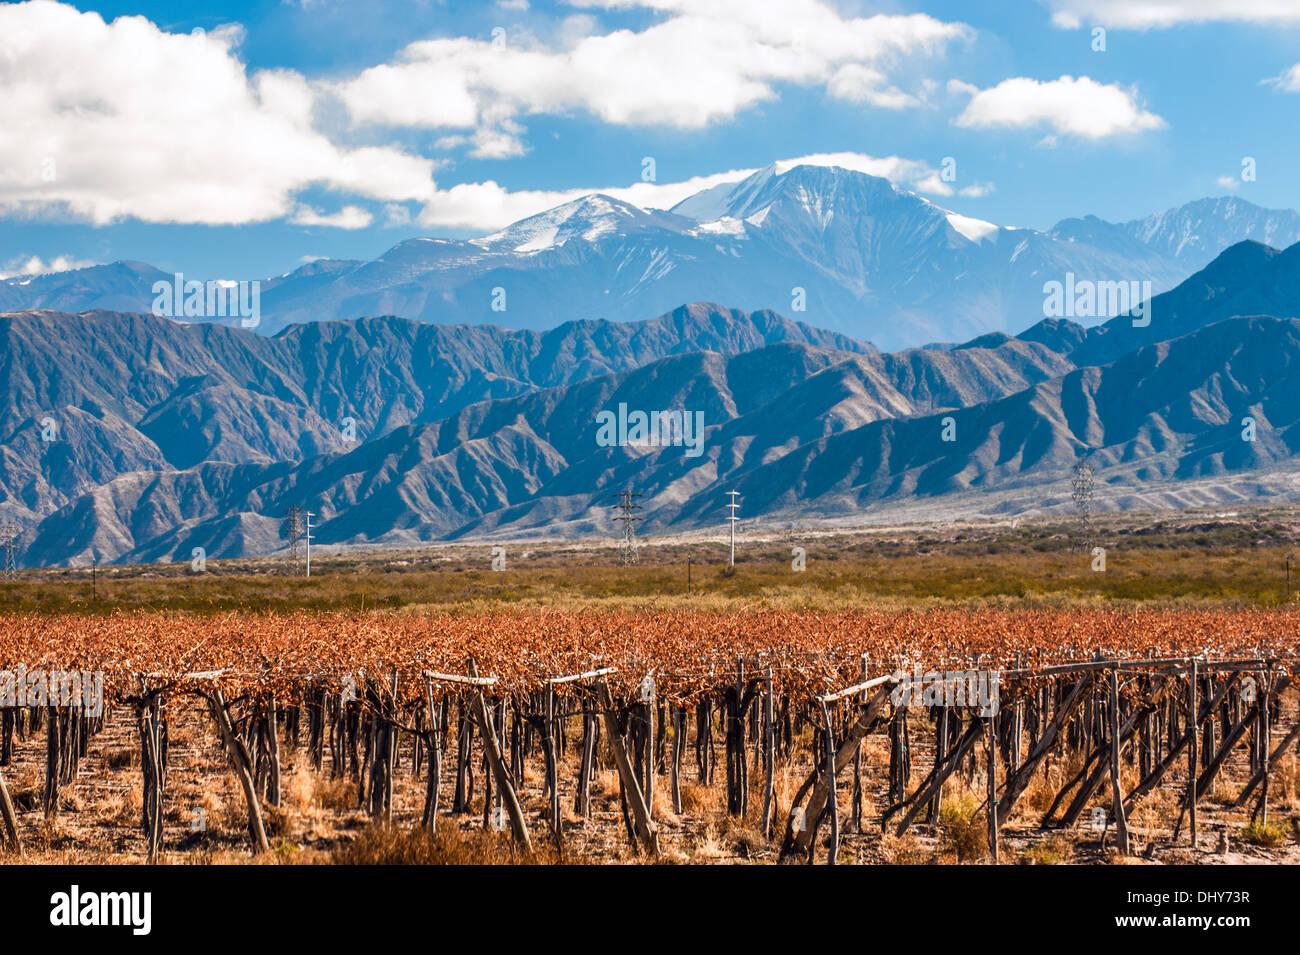 Volcano Aconcagua and Vineyard. Argentine province of Mendoza - Stock Image